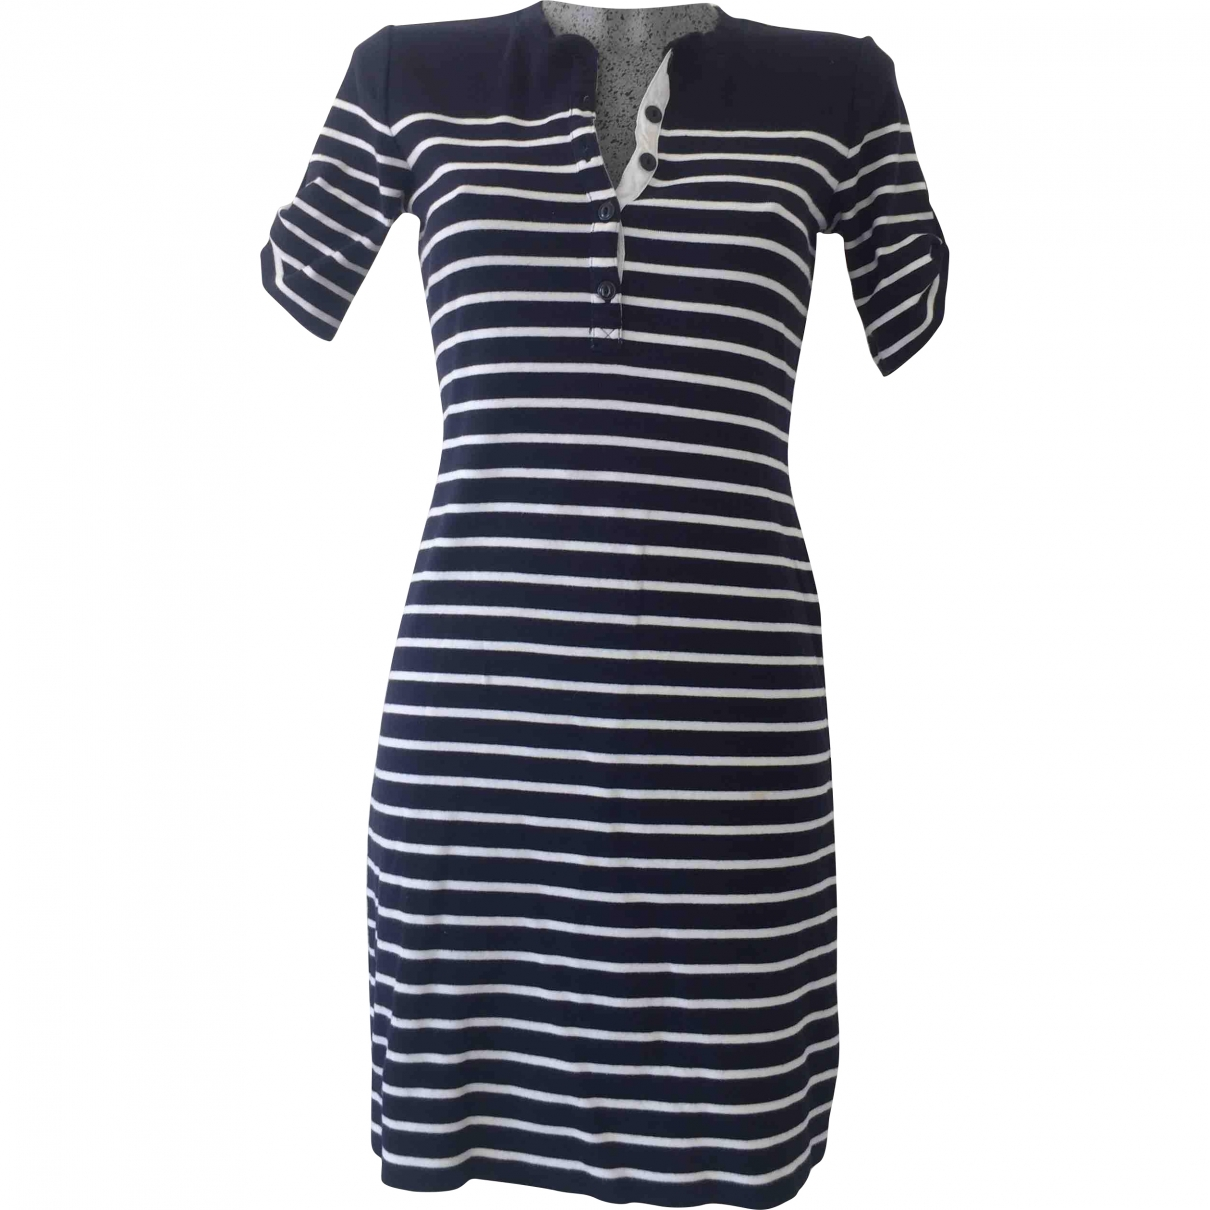 Ralph Lauren Denim & Supply \N Blue Cotton - elasthane dress for Women S International